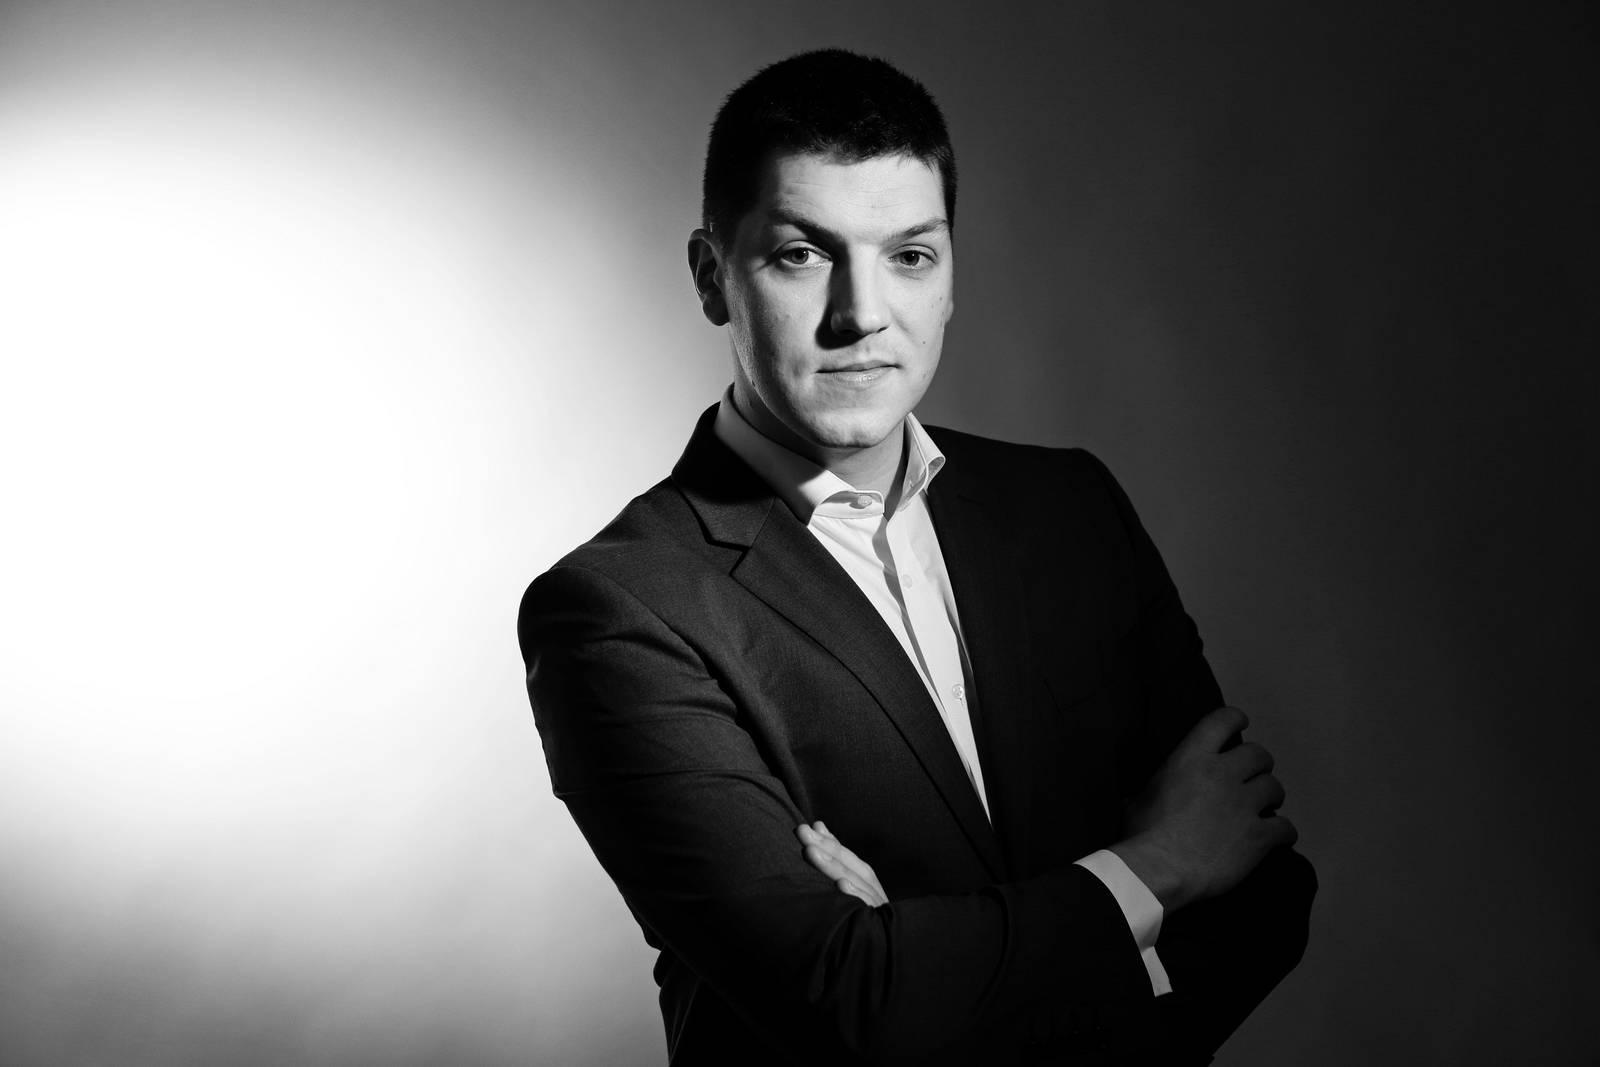 Corporate Headshots Photographers Manchester- 20